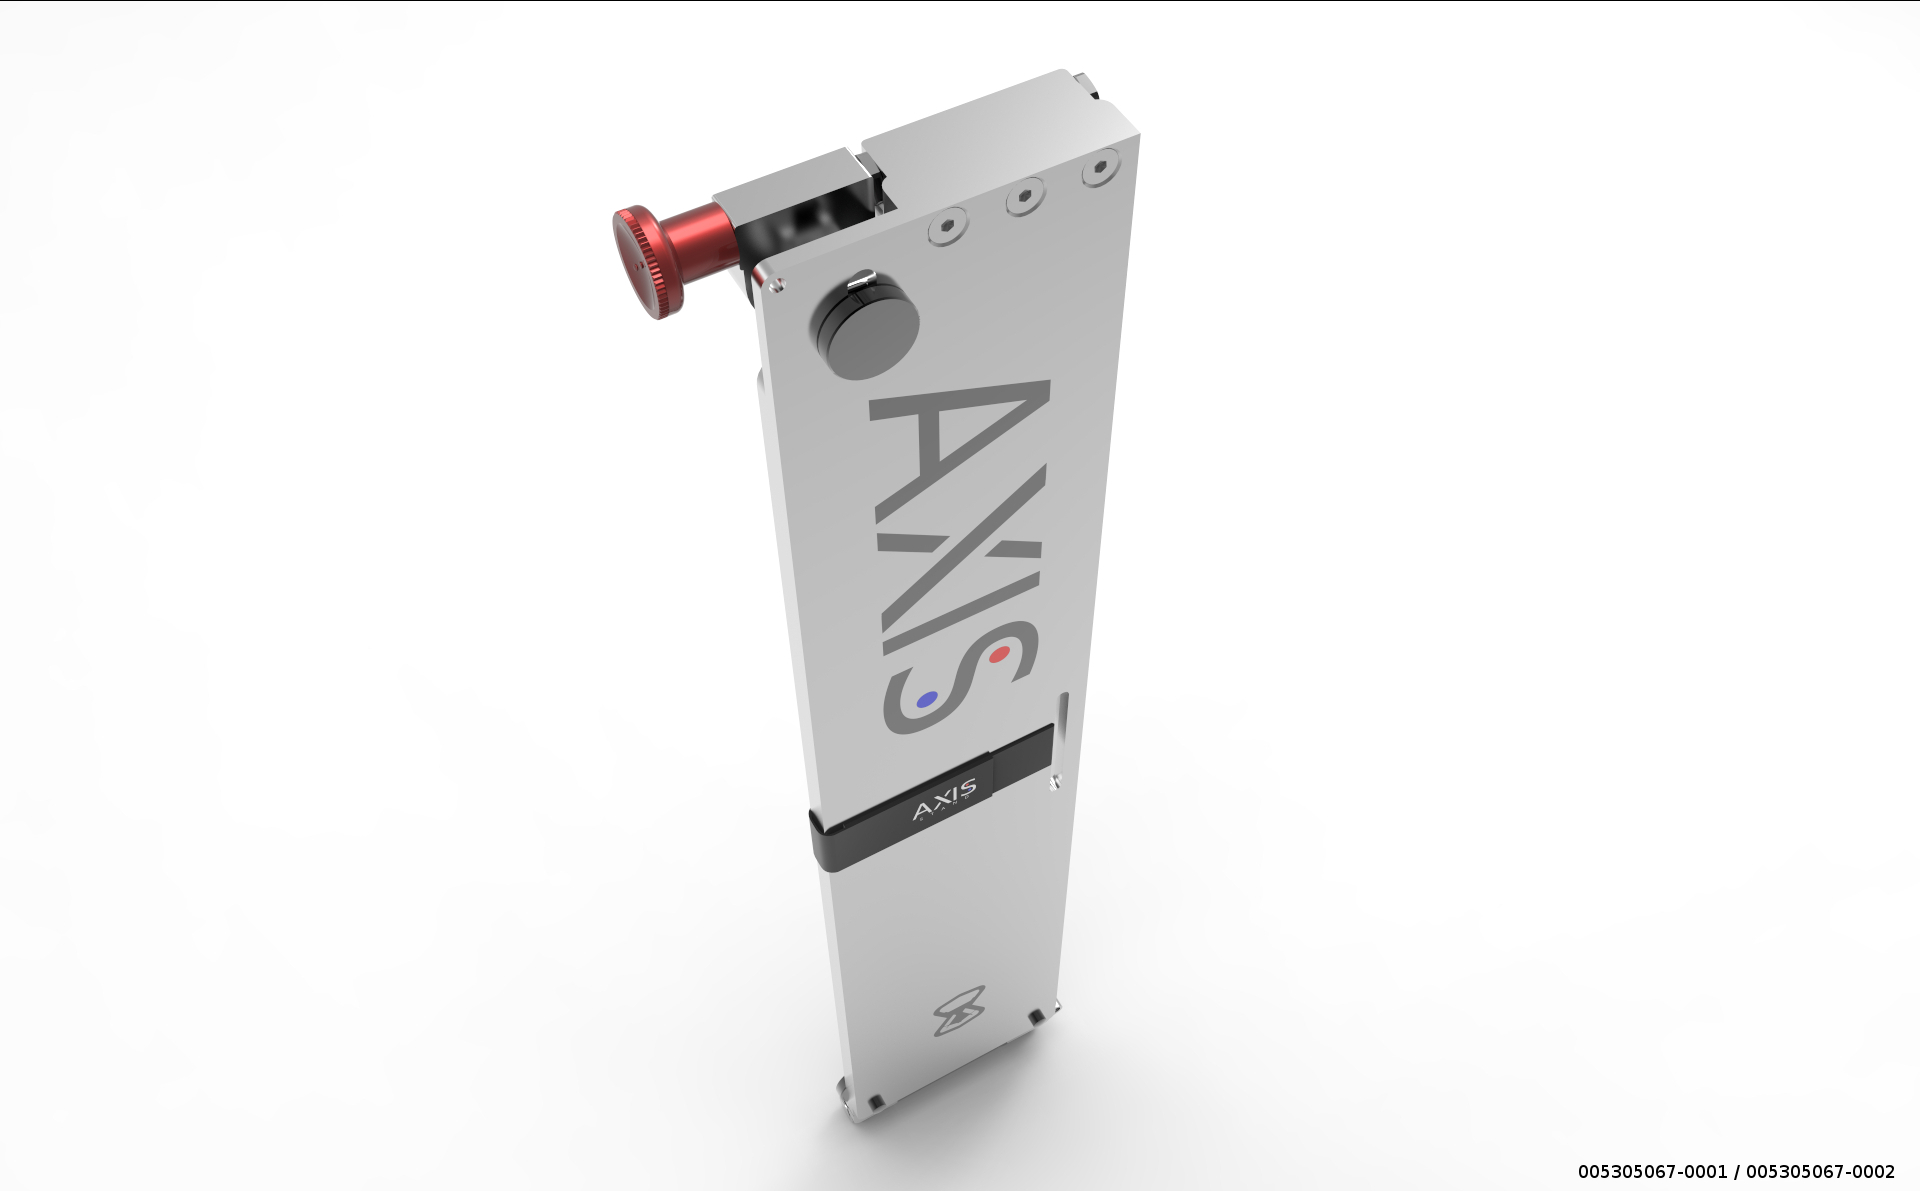 Axis Stand by Juan José de Hoyos Vasco - Creative Work - $i